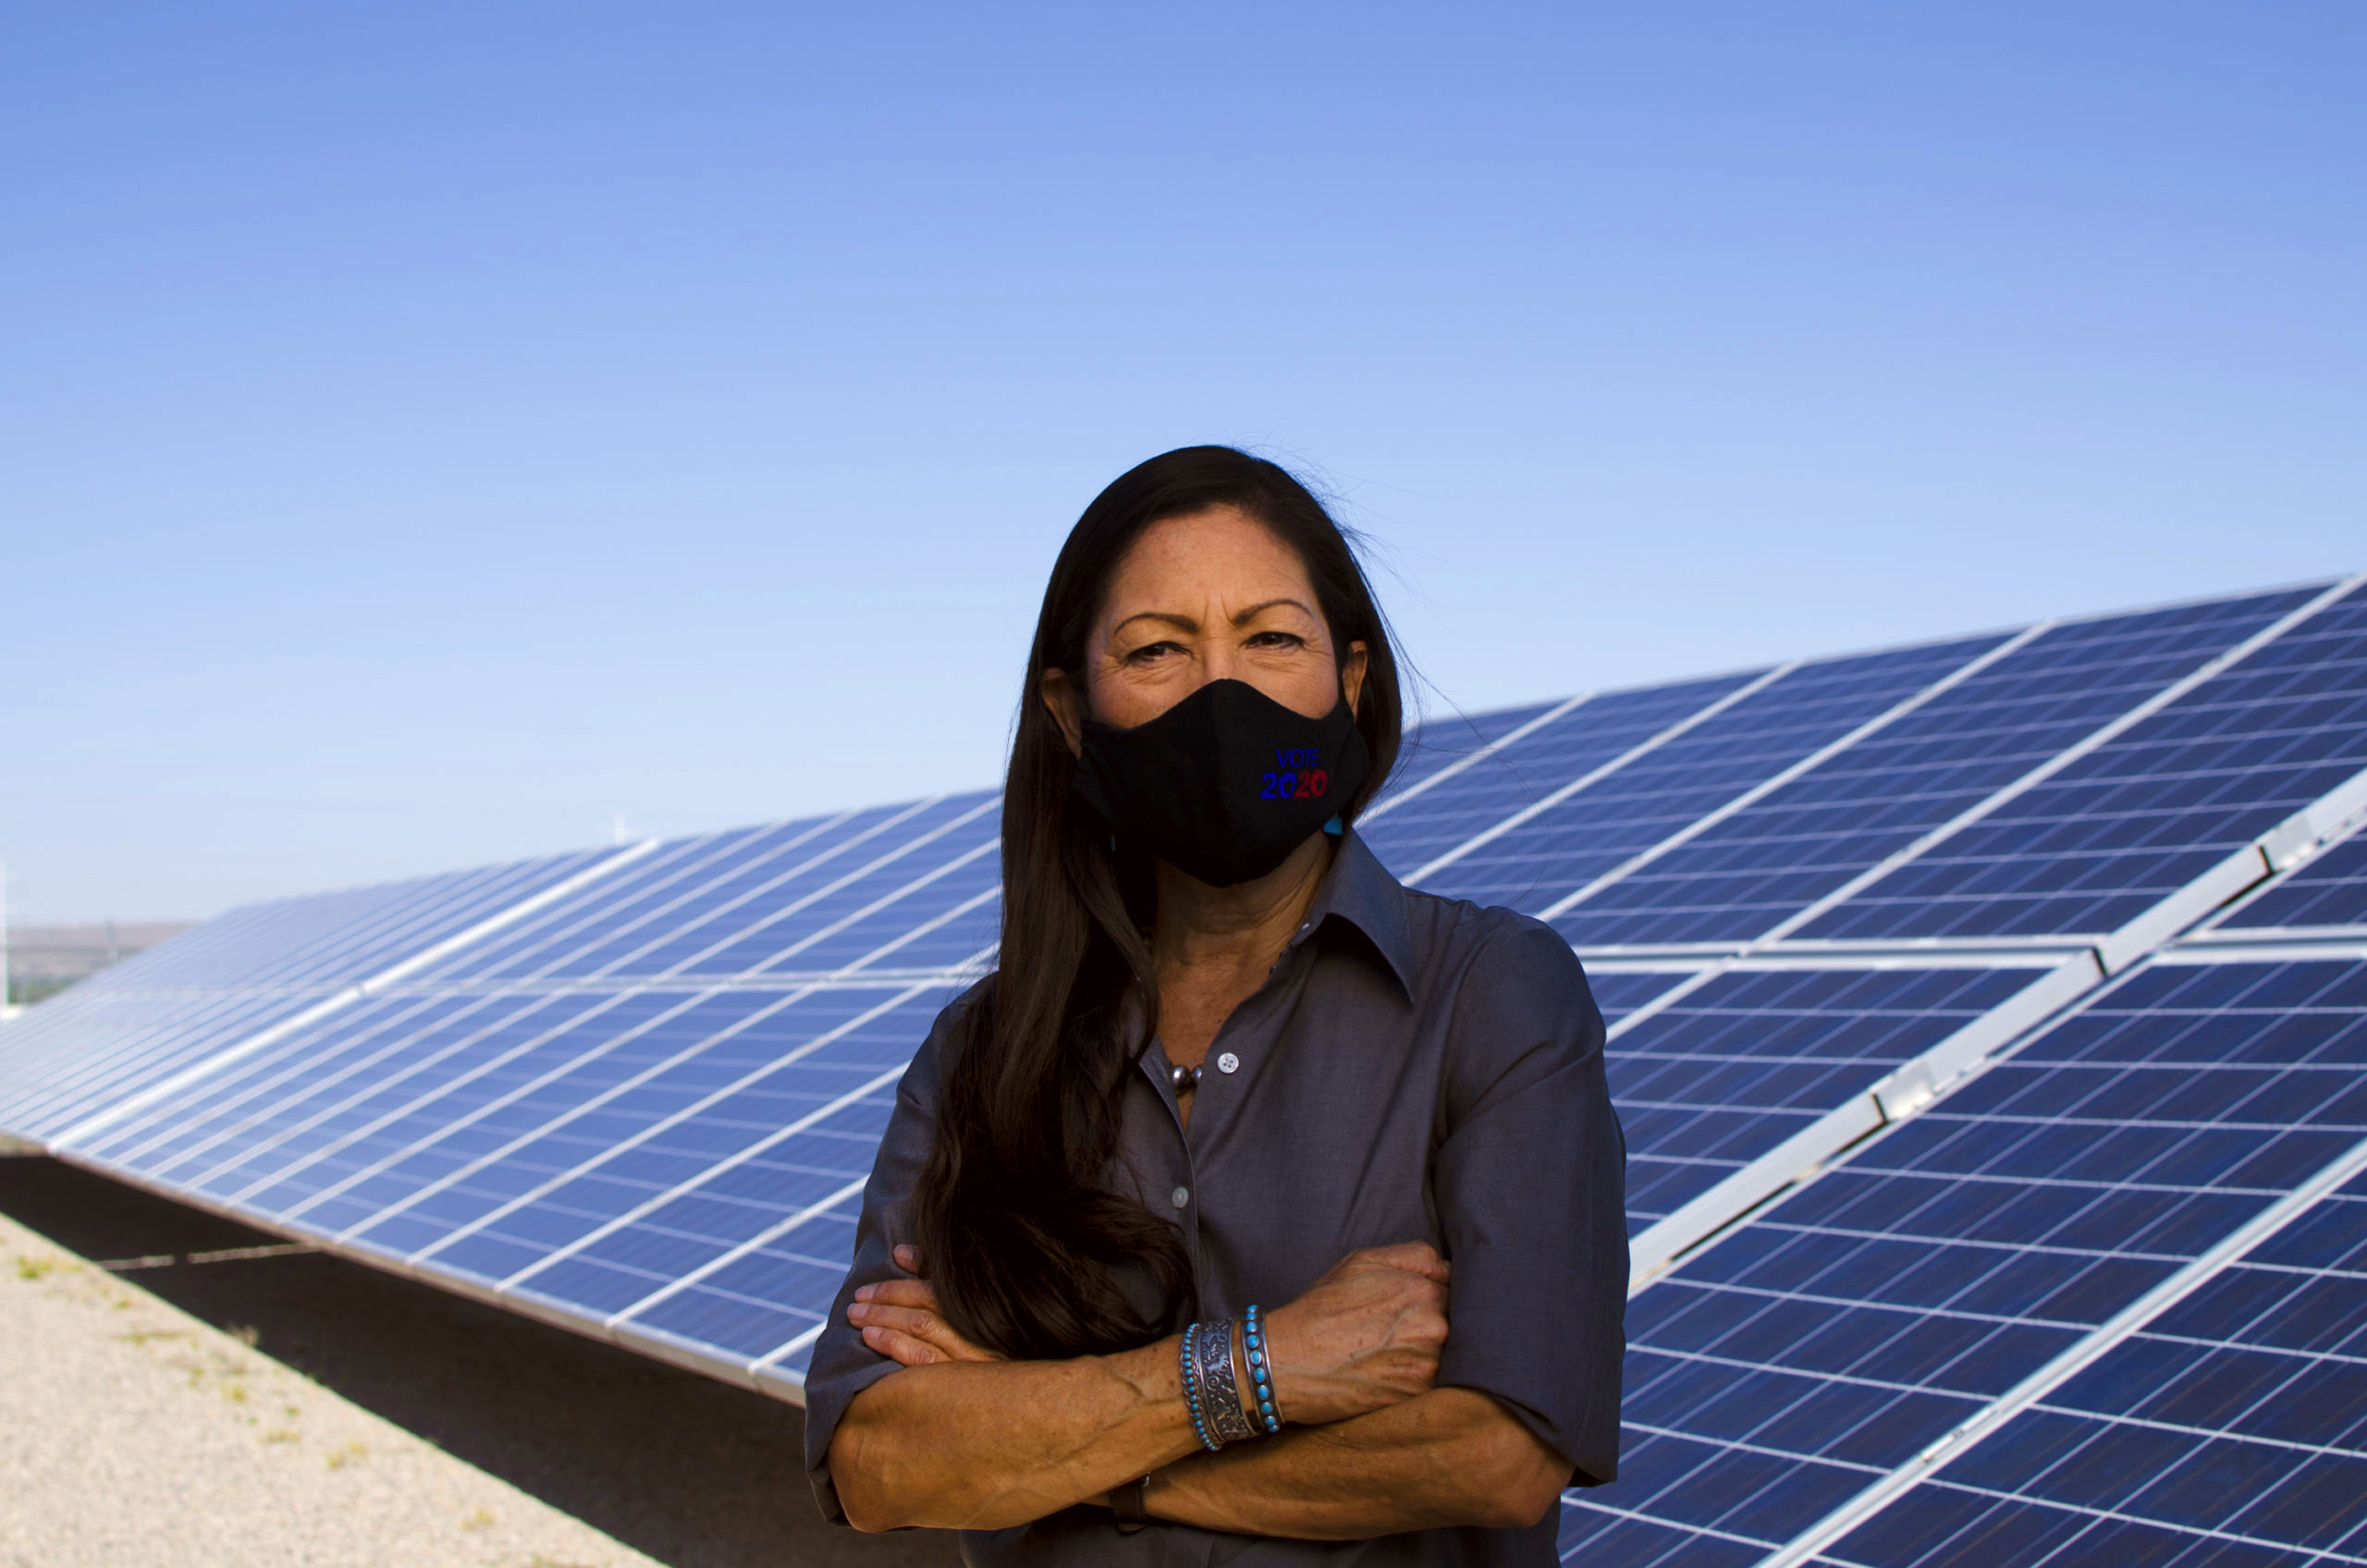 Deb Haaland with solar panels